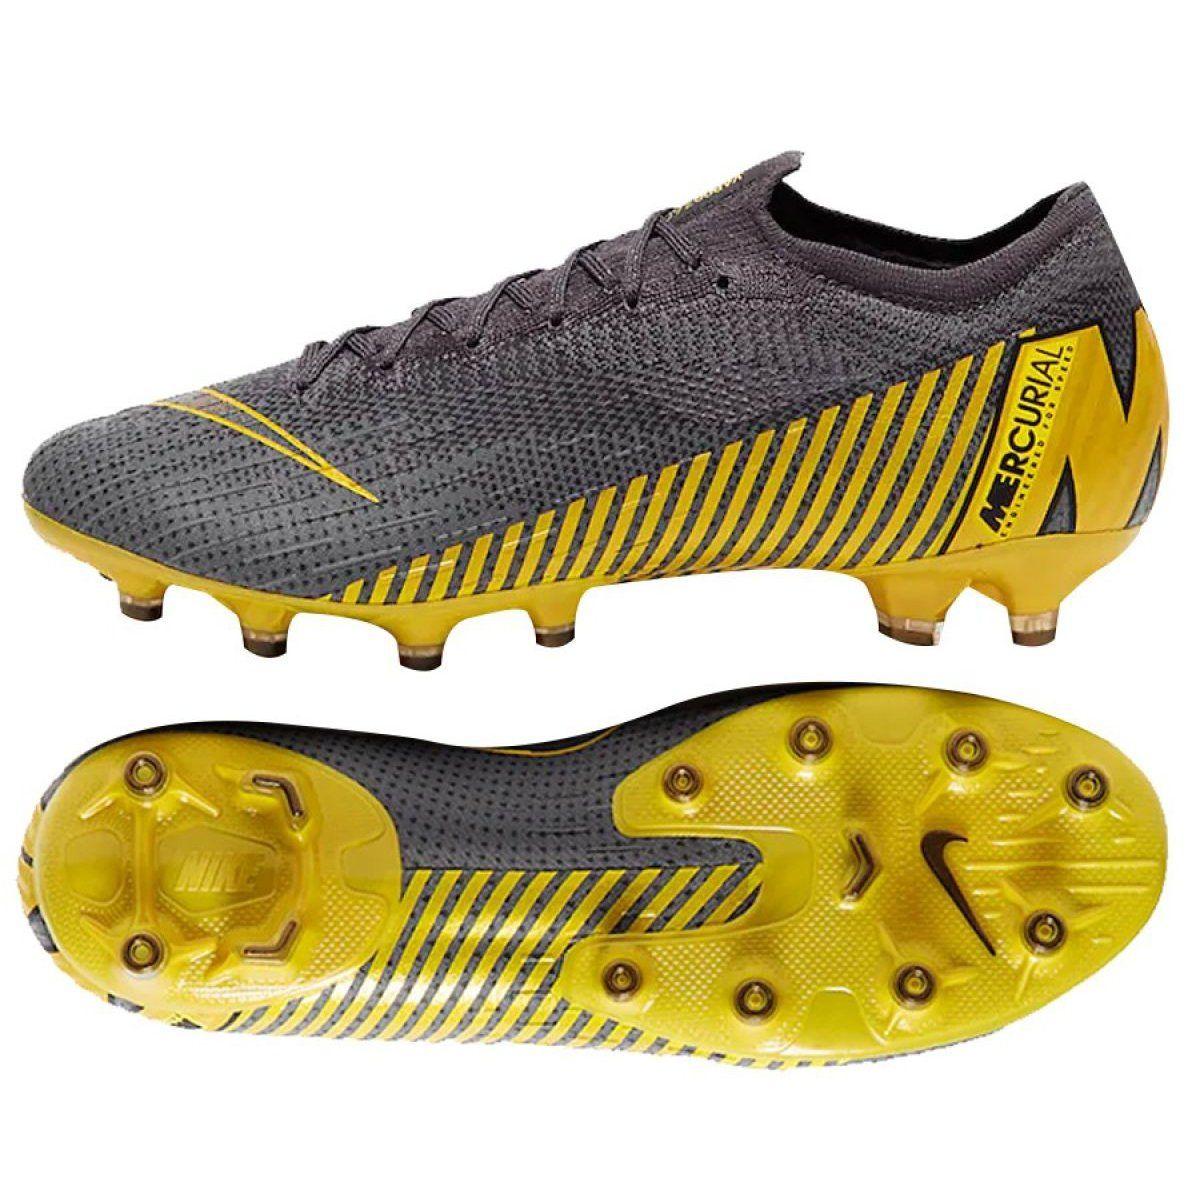 Buty Pilkarskie Nike Mercurial Vapor 12 Elite Ag Pro M Ah7379 070 Szare Szare Soccer Boots Football Shoes Sports Footwear